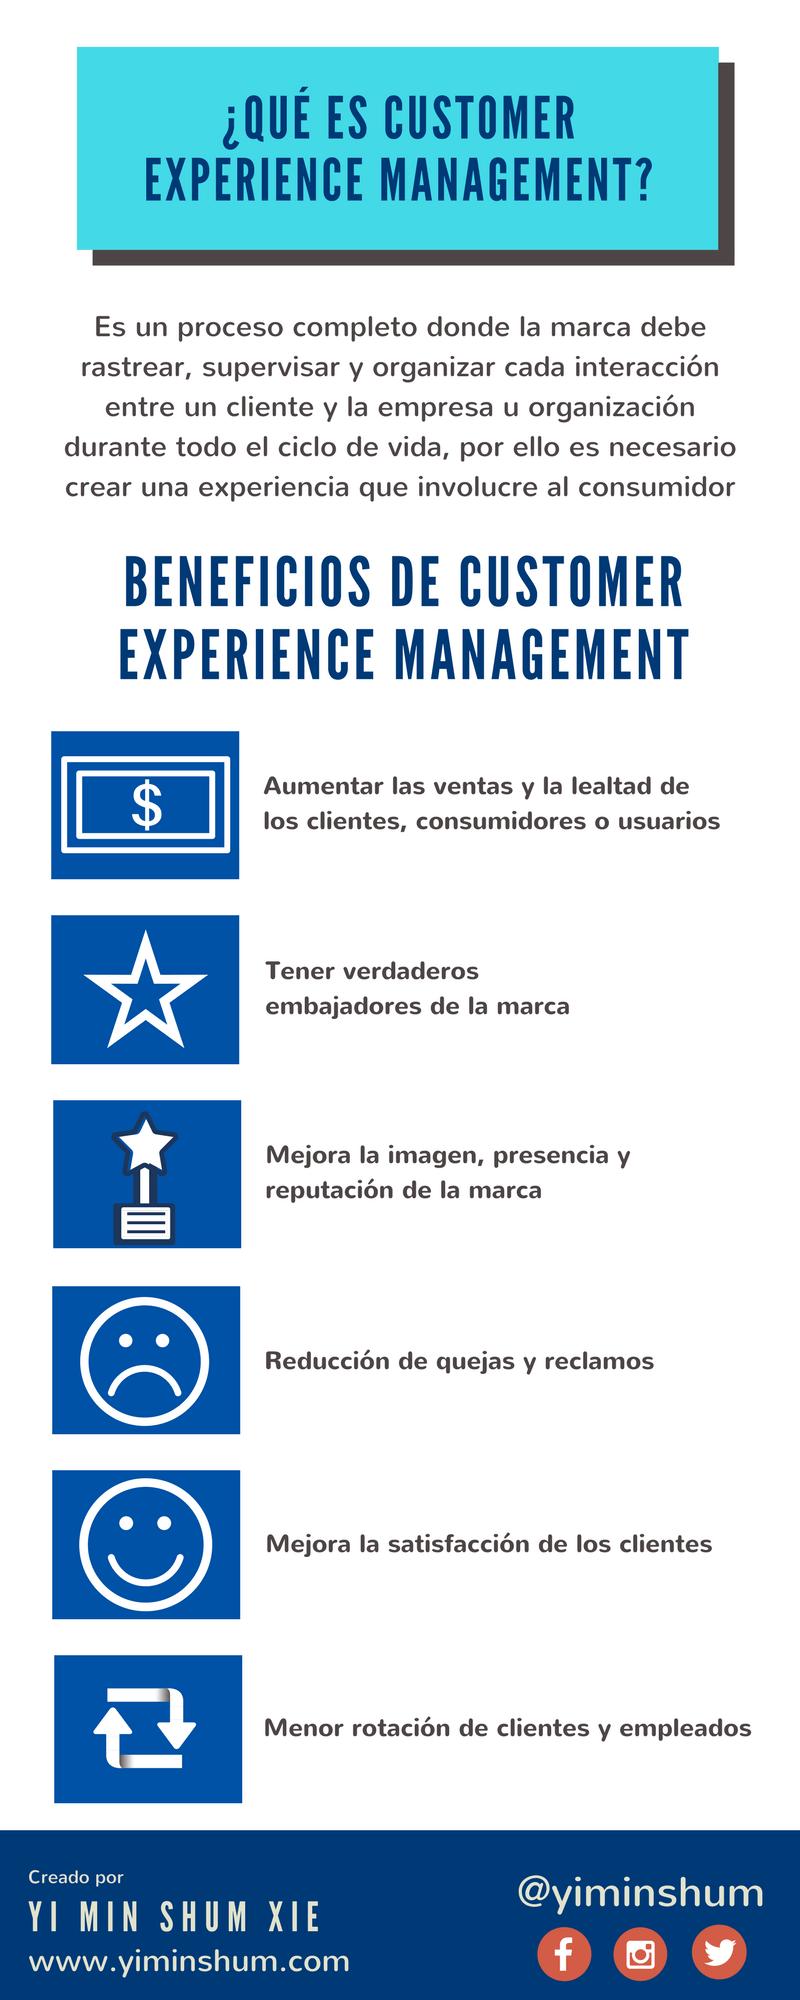 Qué es Customer Experience Management